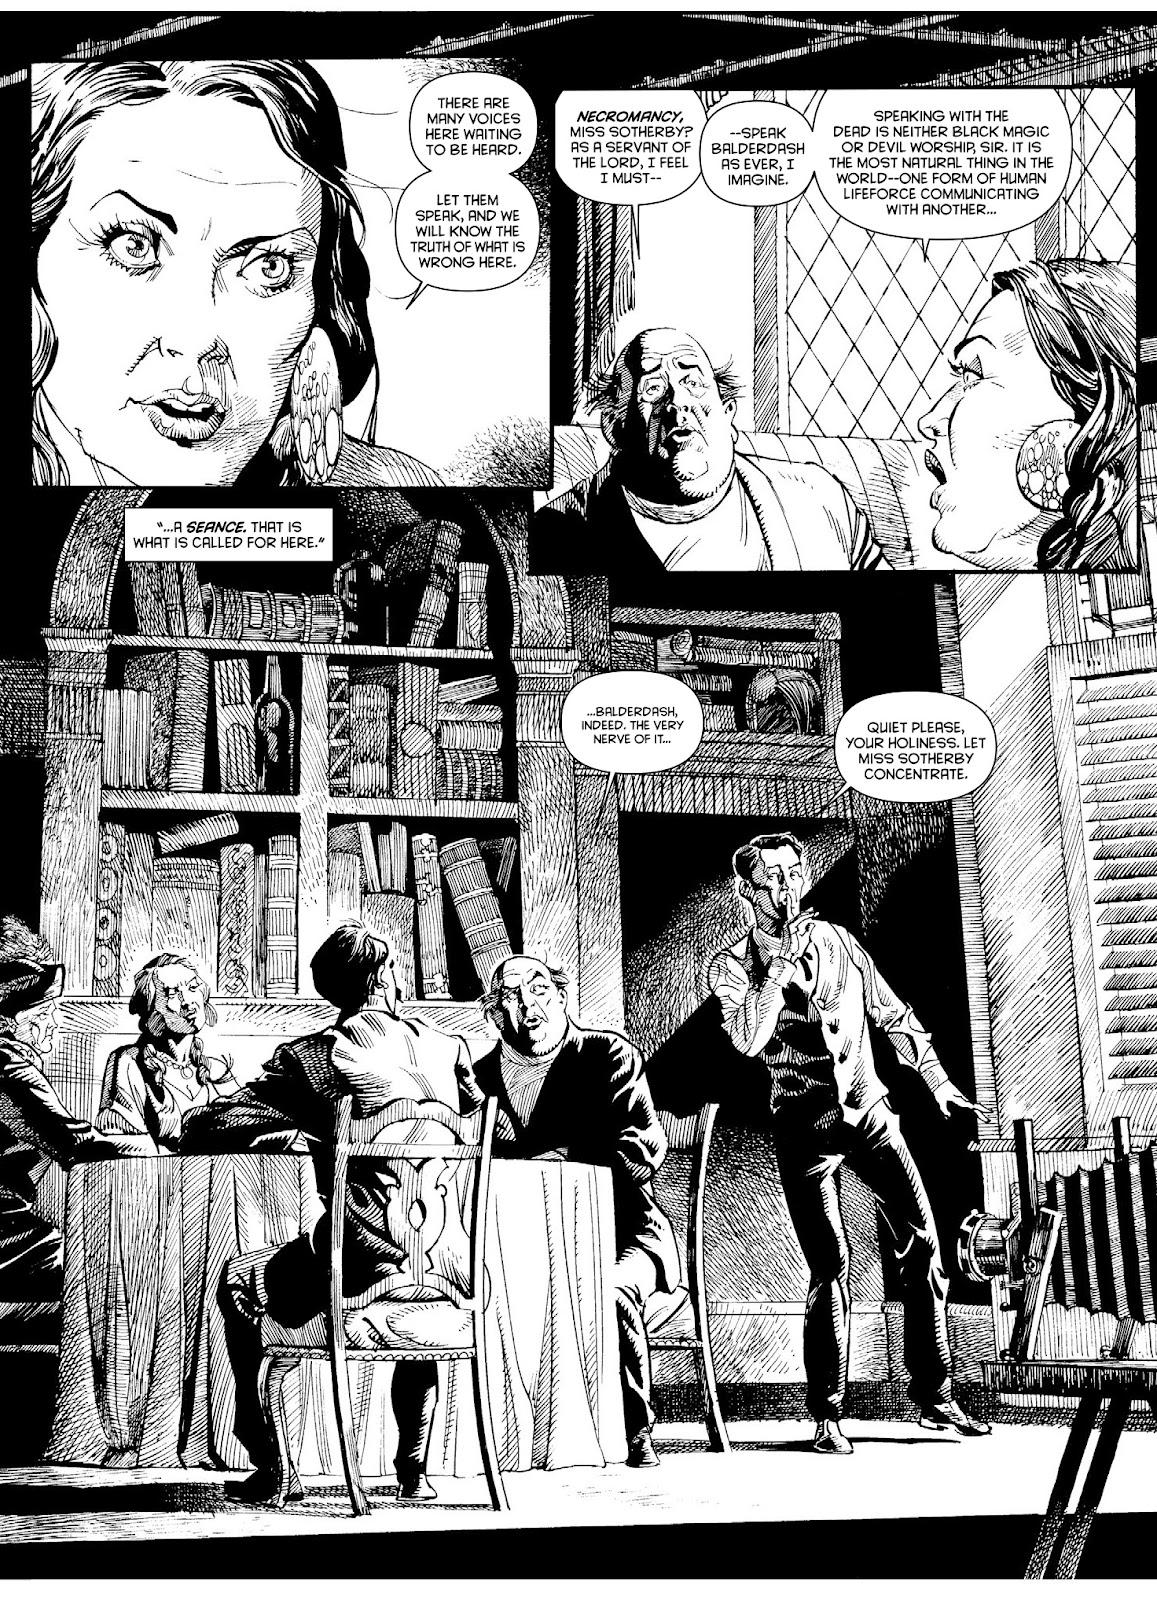 Judge Dredd Megazine (Vol. 5) issue 427 - Page 80